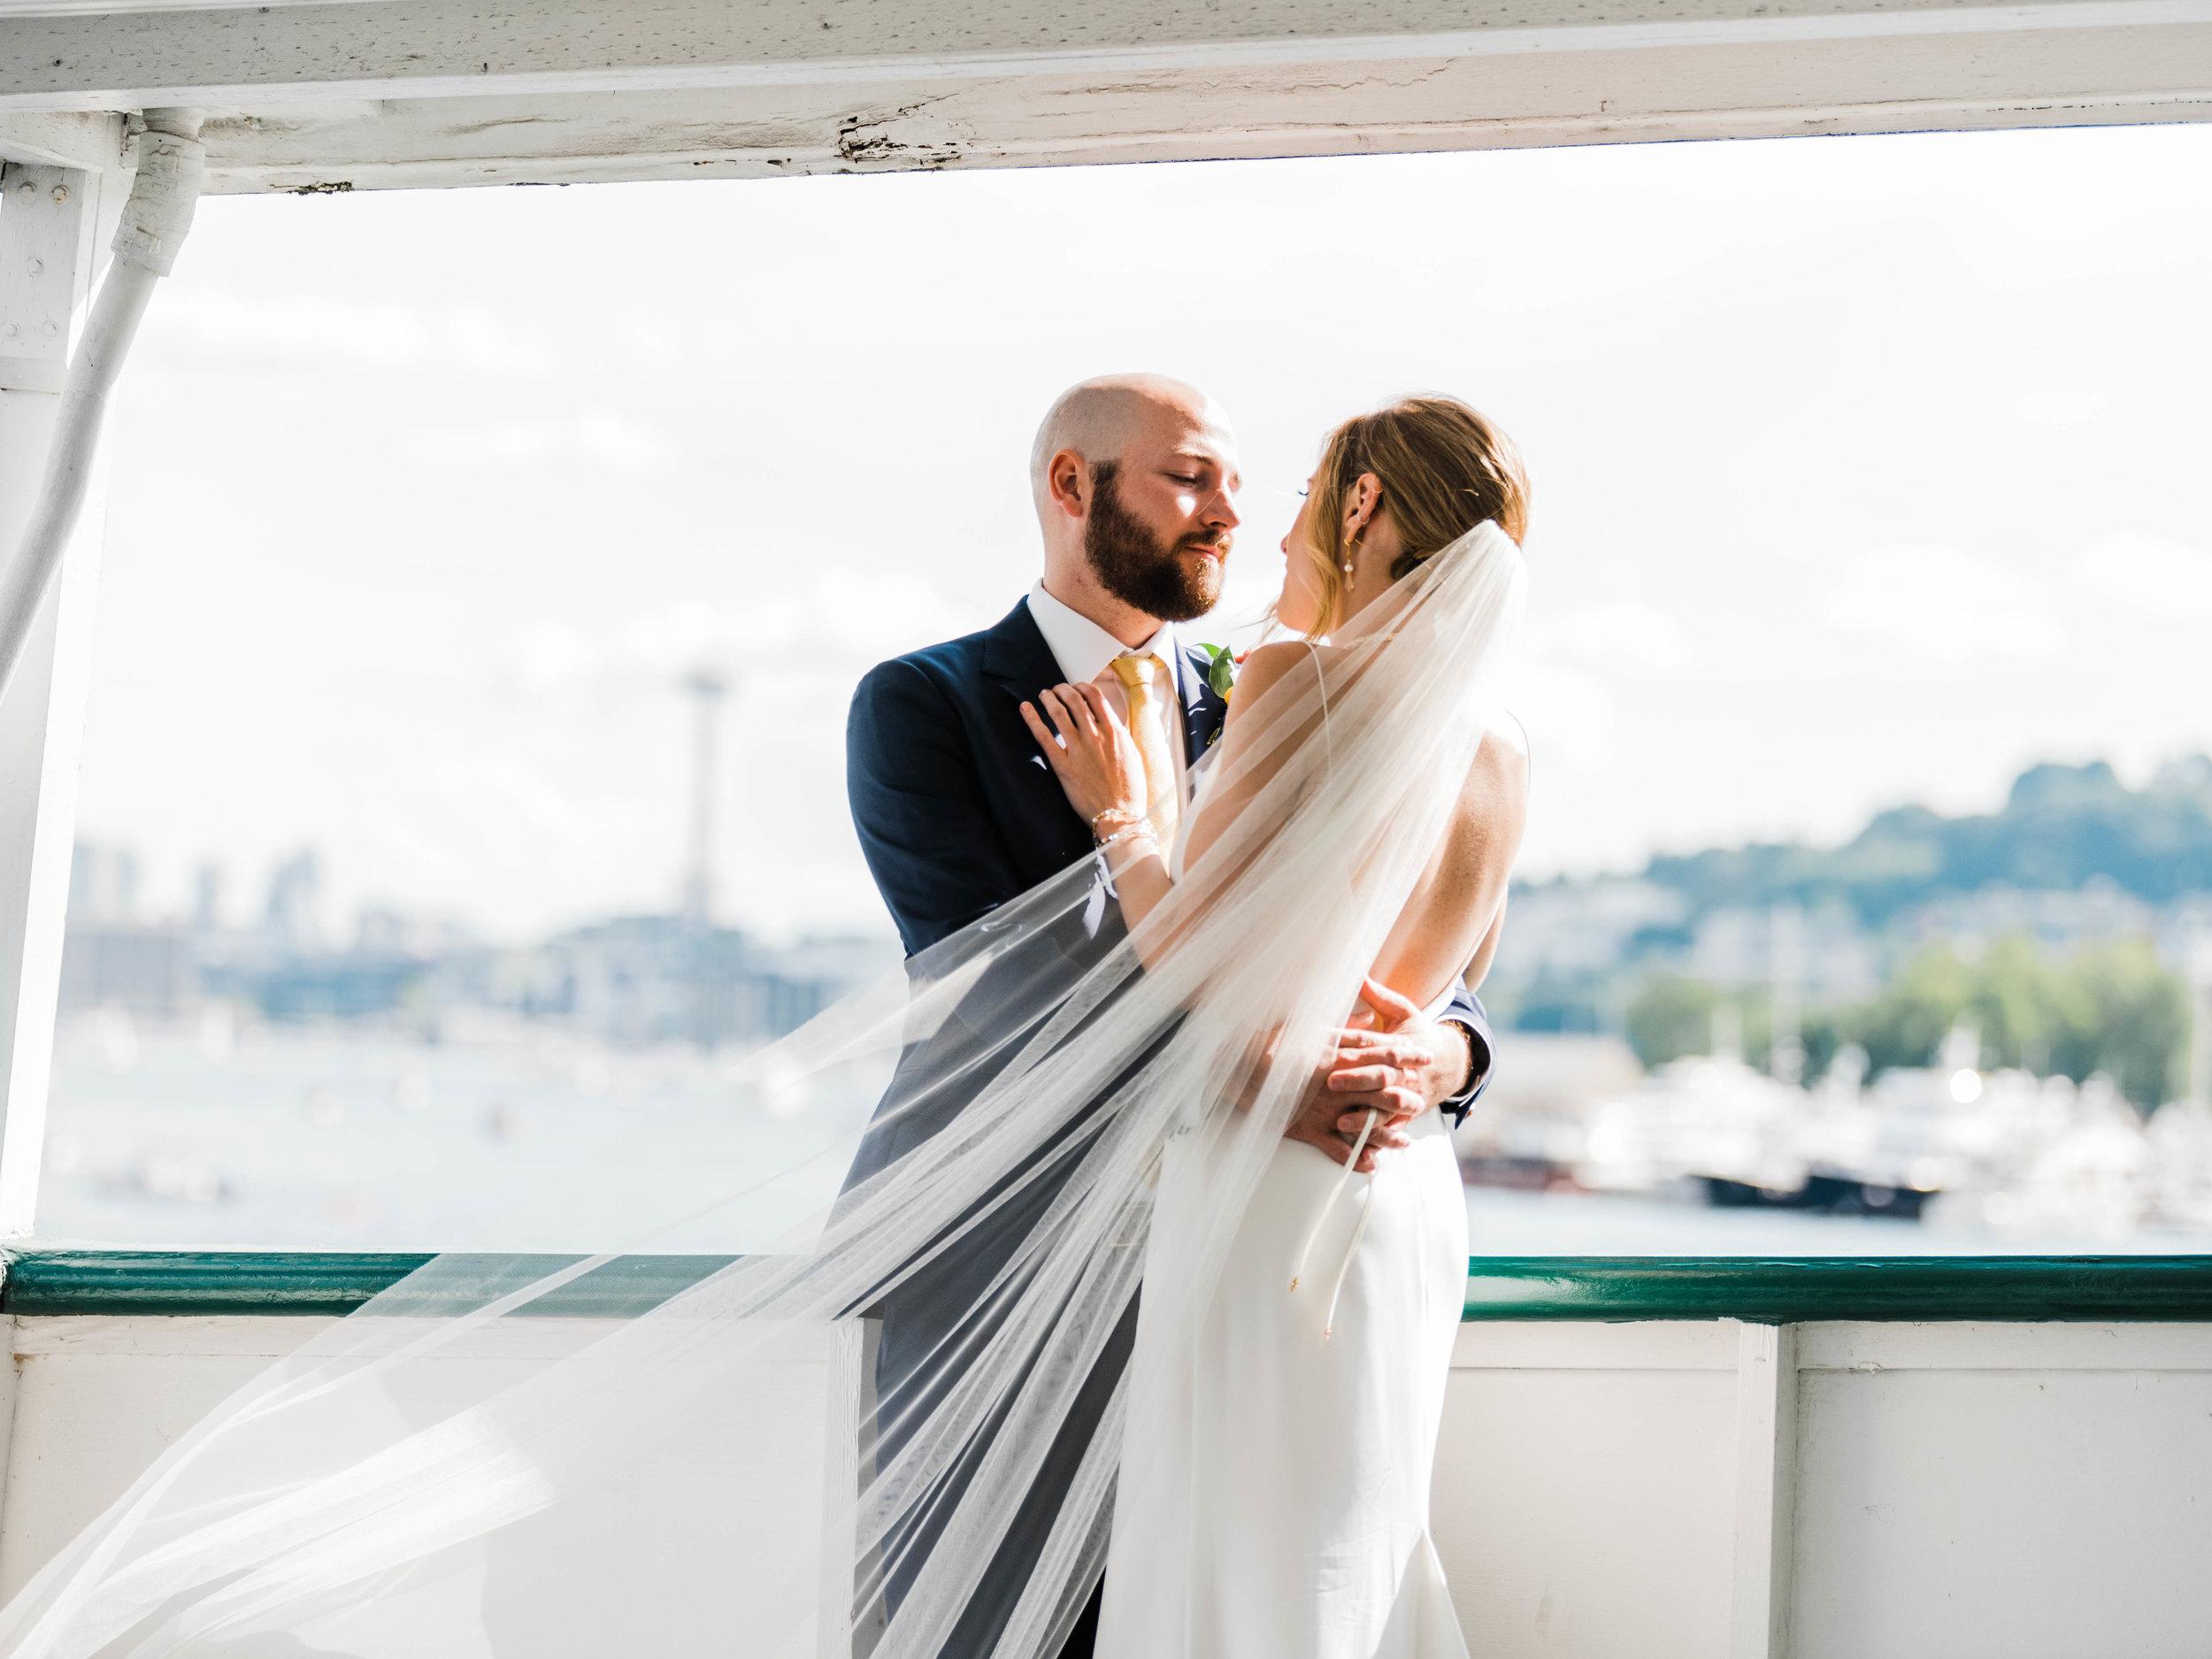 Seattle Wedding- MV Skansonia - Anna + Josh -  (1132) - Copy.jpg